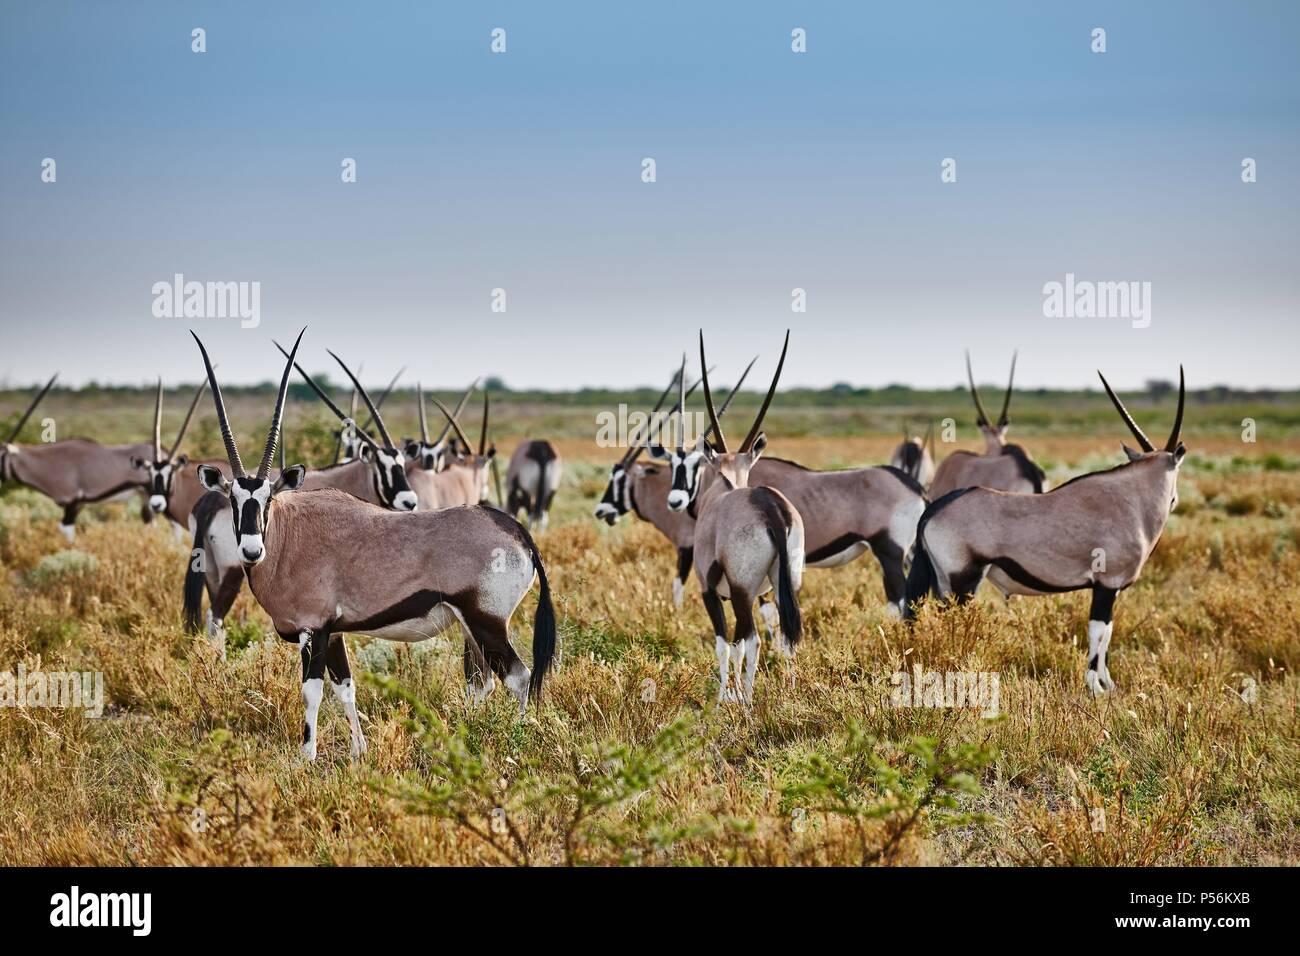 gemsboks - Stock Image